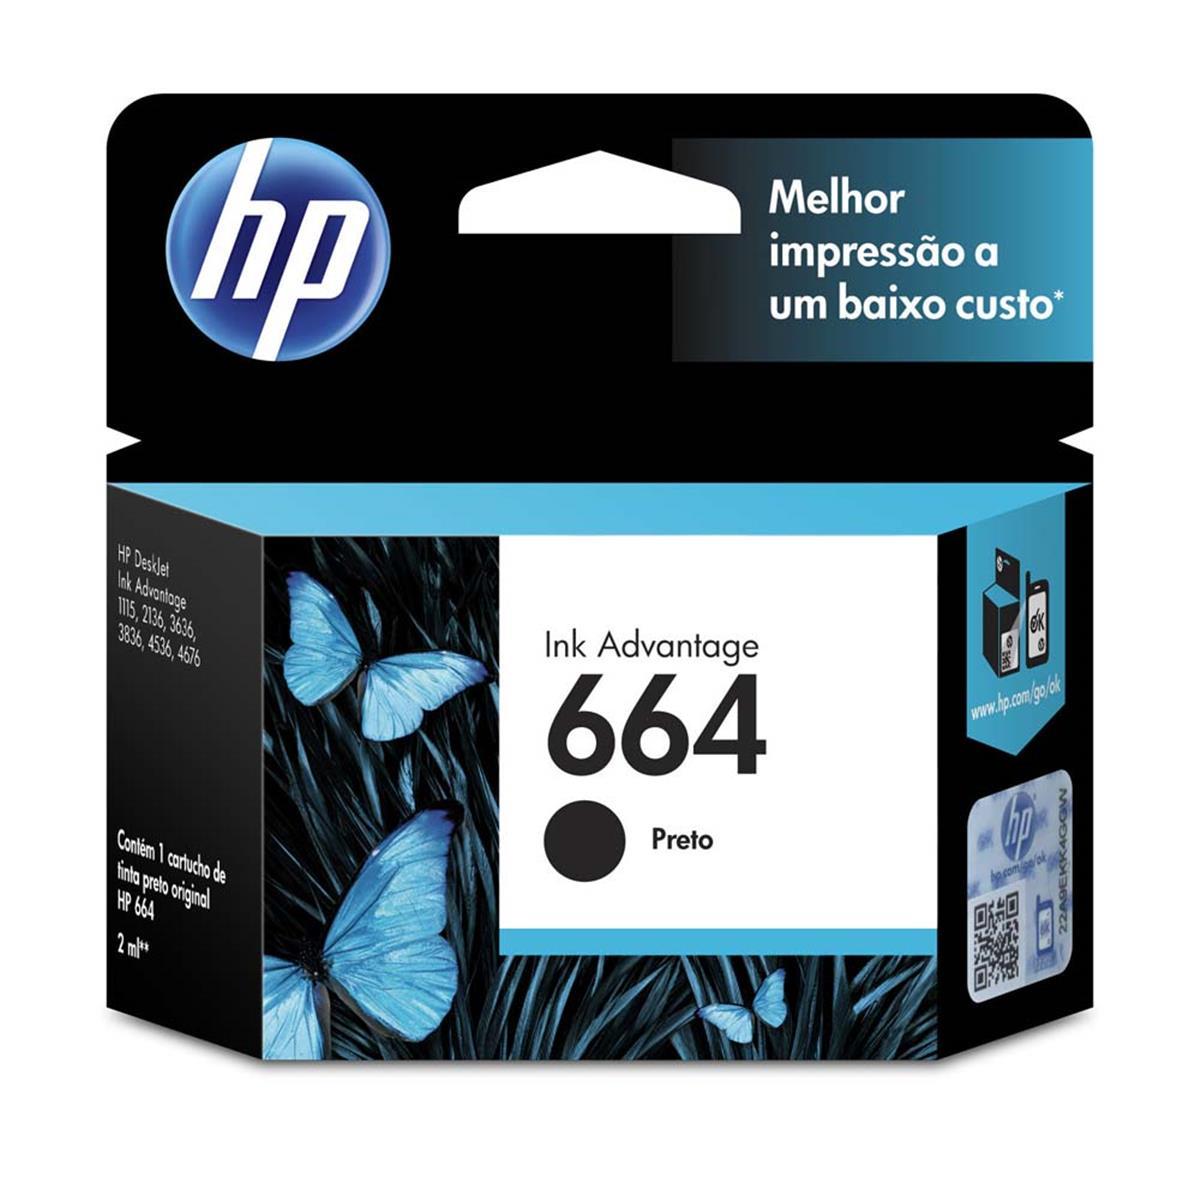 Cartucho HP 664 Jato de Tinta Preto 2ML - F6V29AB